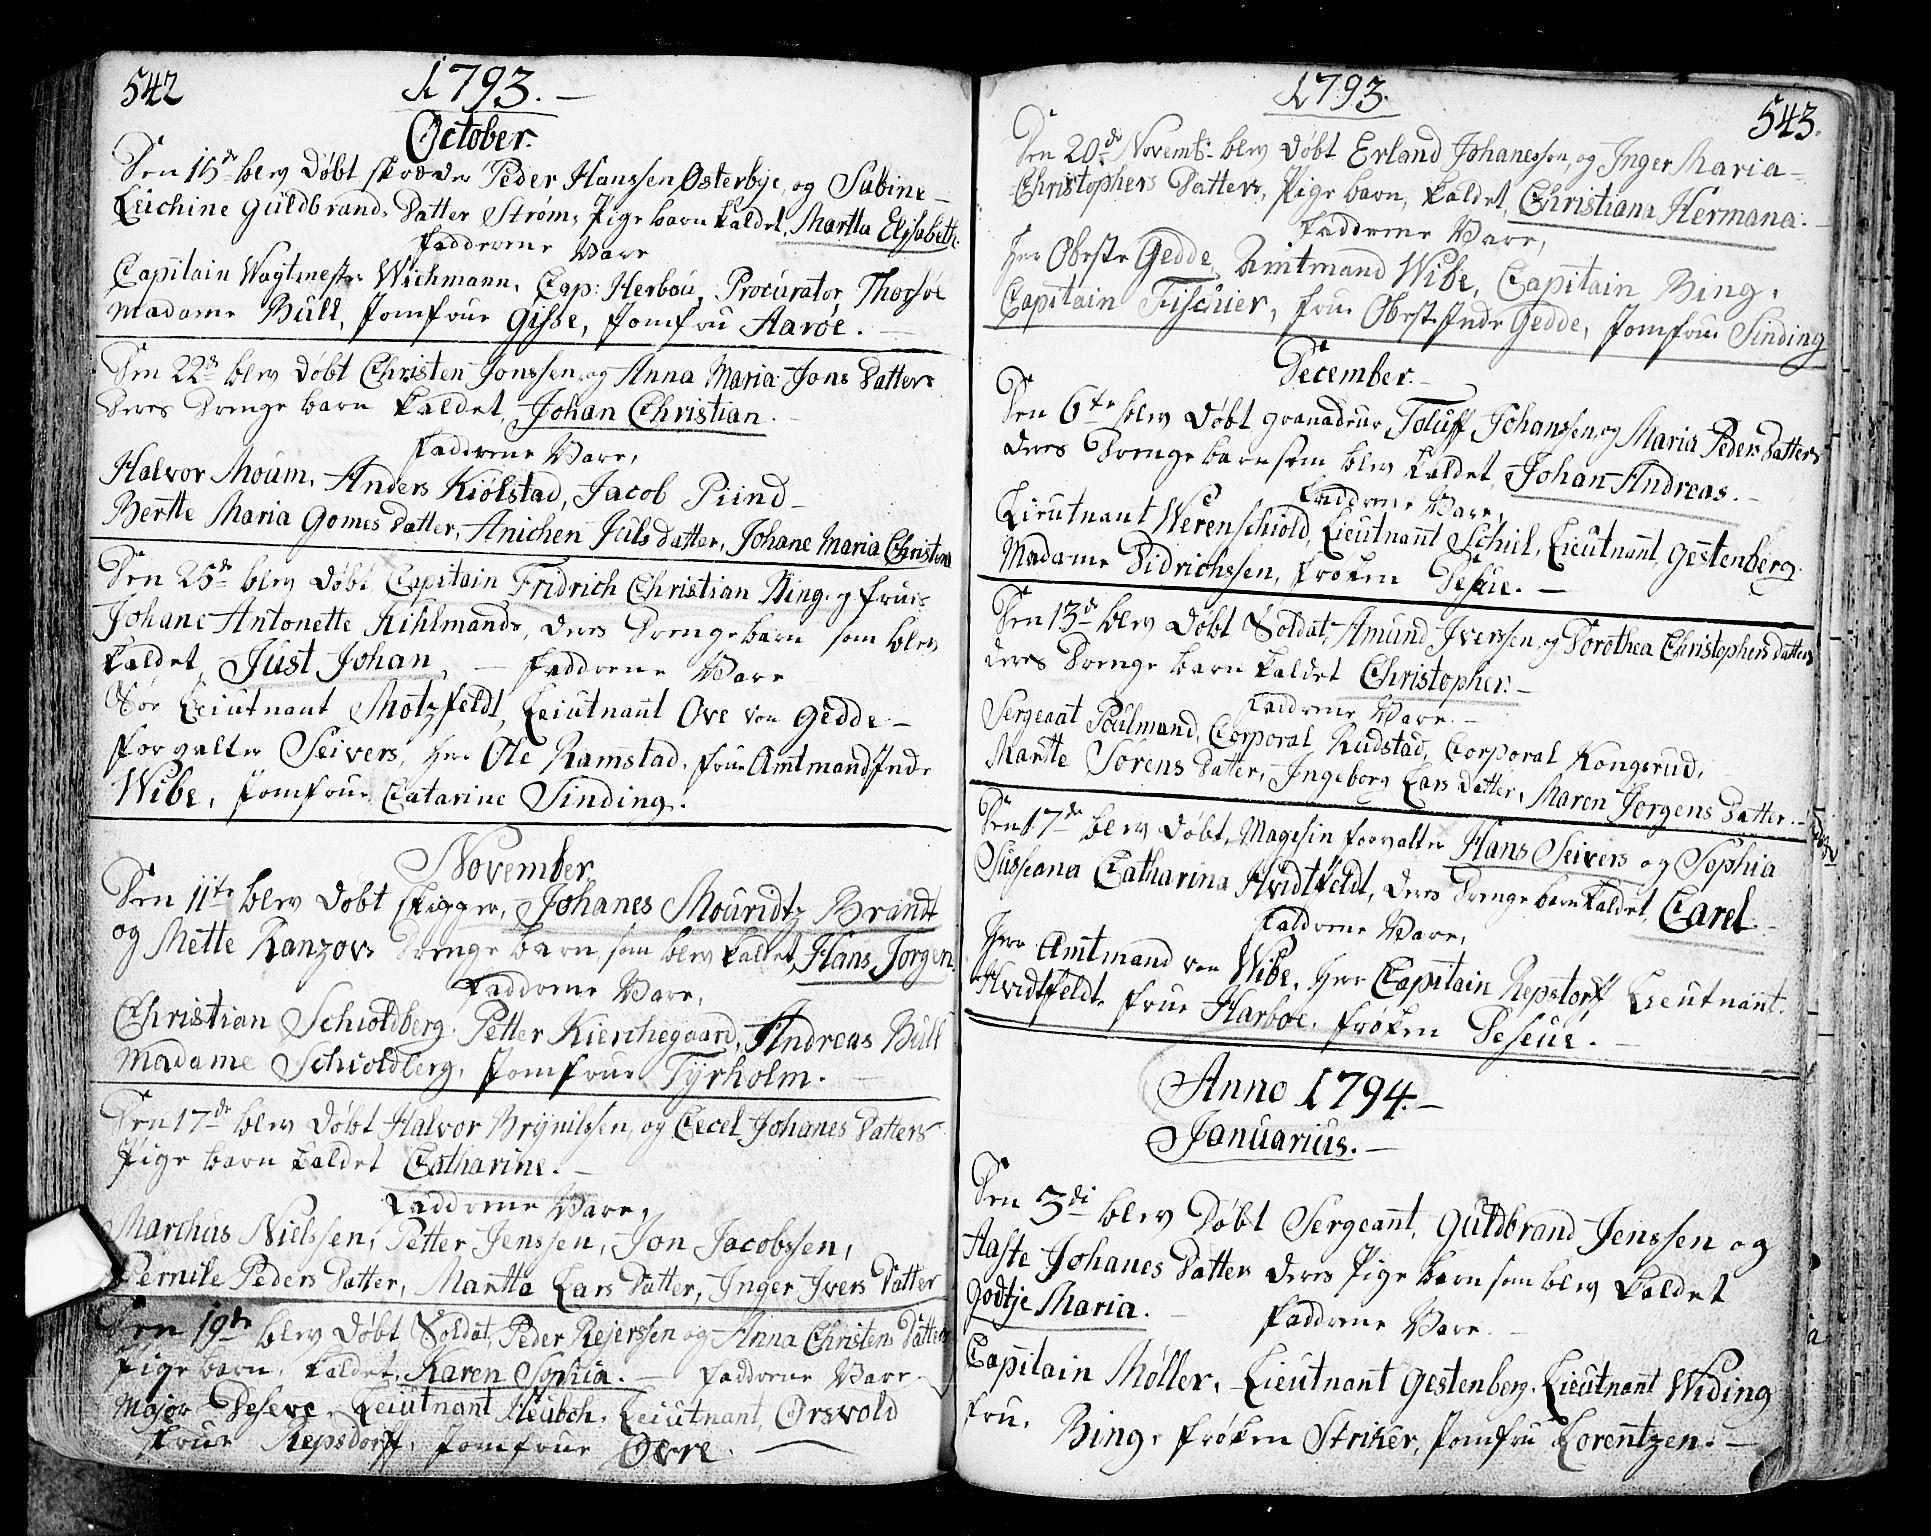 SAO, Fredrikstad prestekontor Kirkebøker, F/Fa/L0002: Ministerialbok nr. 2, 1750-1804, s. 542-543